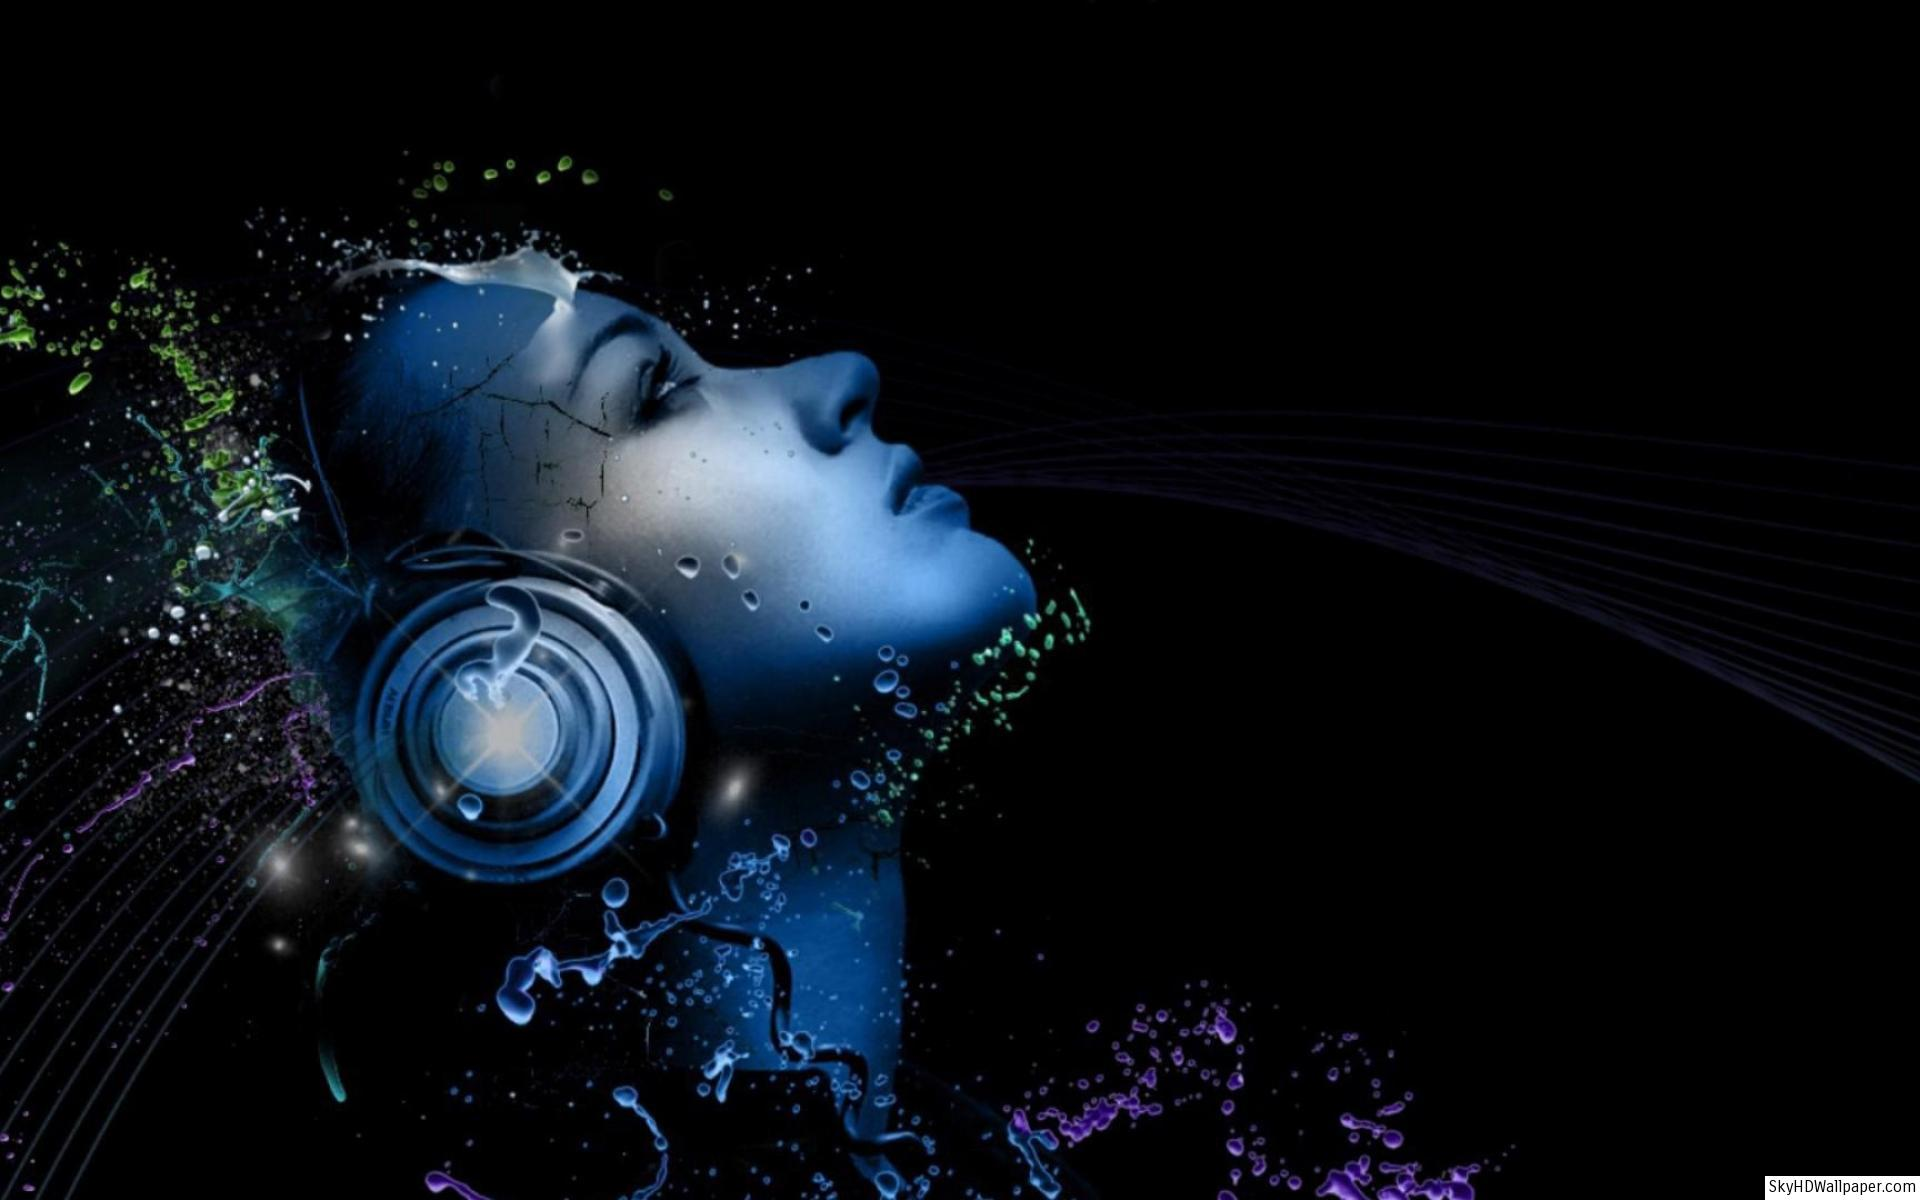 10 Best House Music Dj Wallpaper Full Hd 1080p For Pc: Music Art Wallpapers High Quality